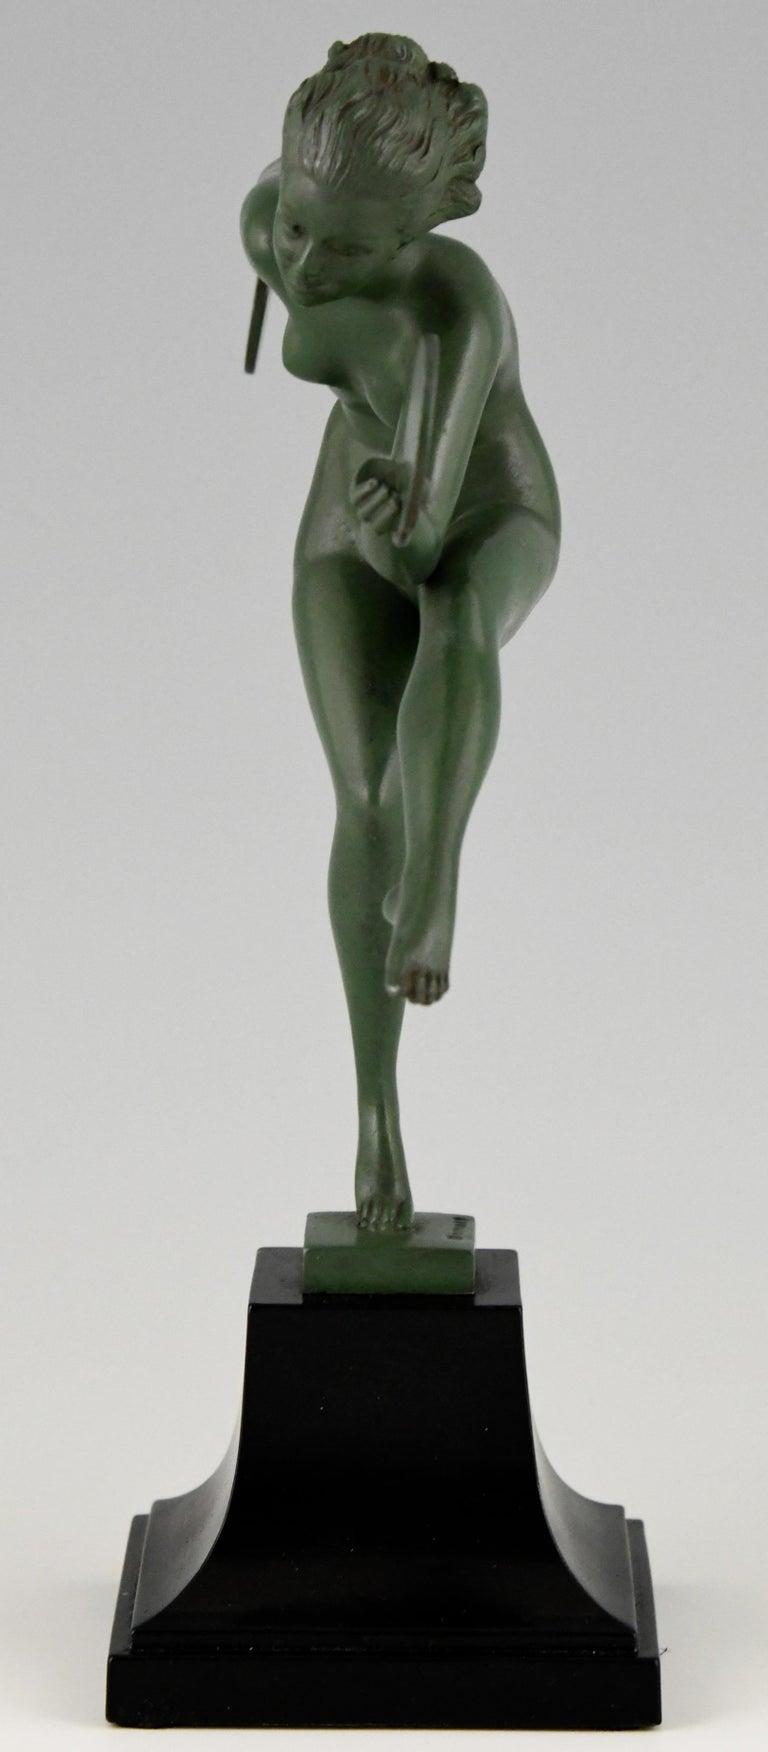 Patinated Art Deco Sculpture Nude Disc Dancer Derenne, Marcel Bouraine, France, 1930 For Sale